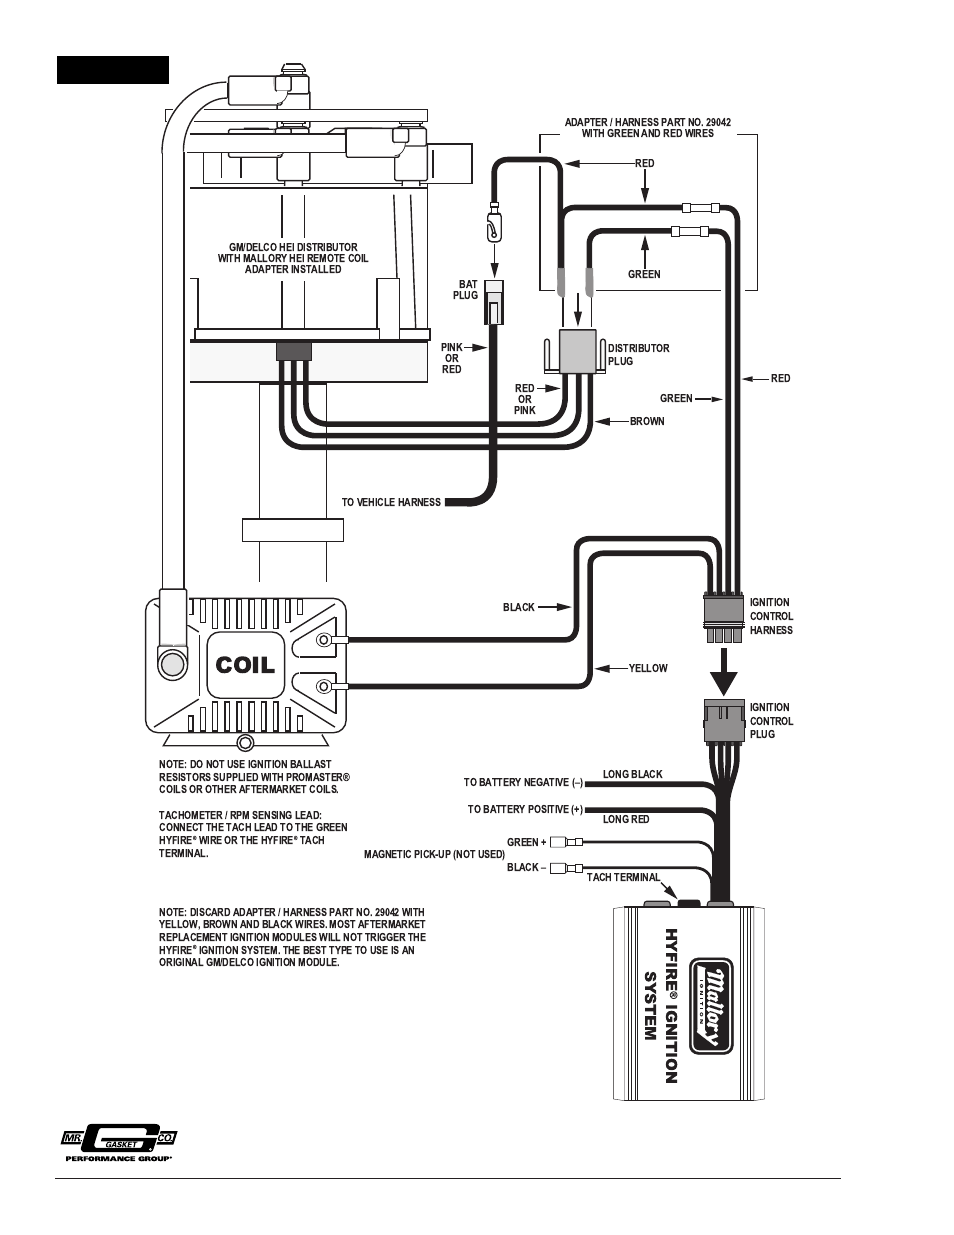 WRG-9367] Accel 59107 Hei Distributor Wiring Diagram on